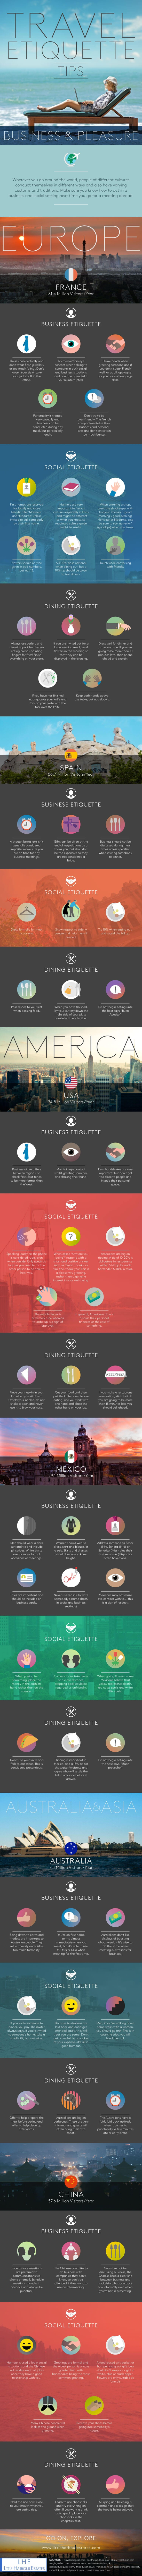 Travel Etiquette Tips - Infographic